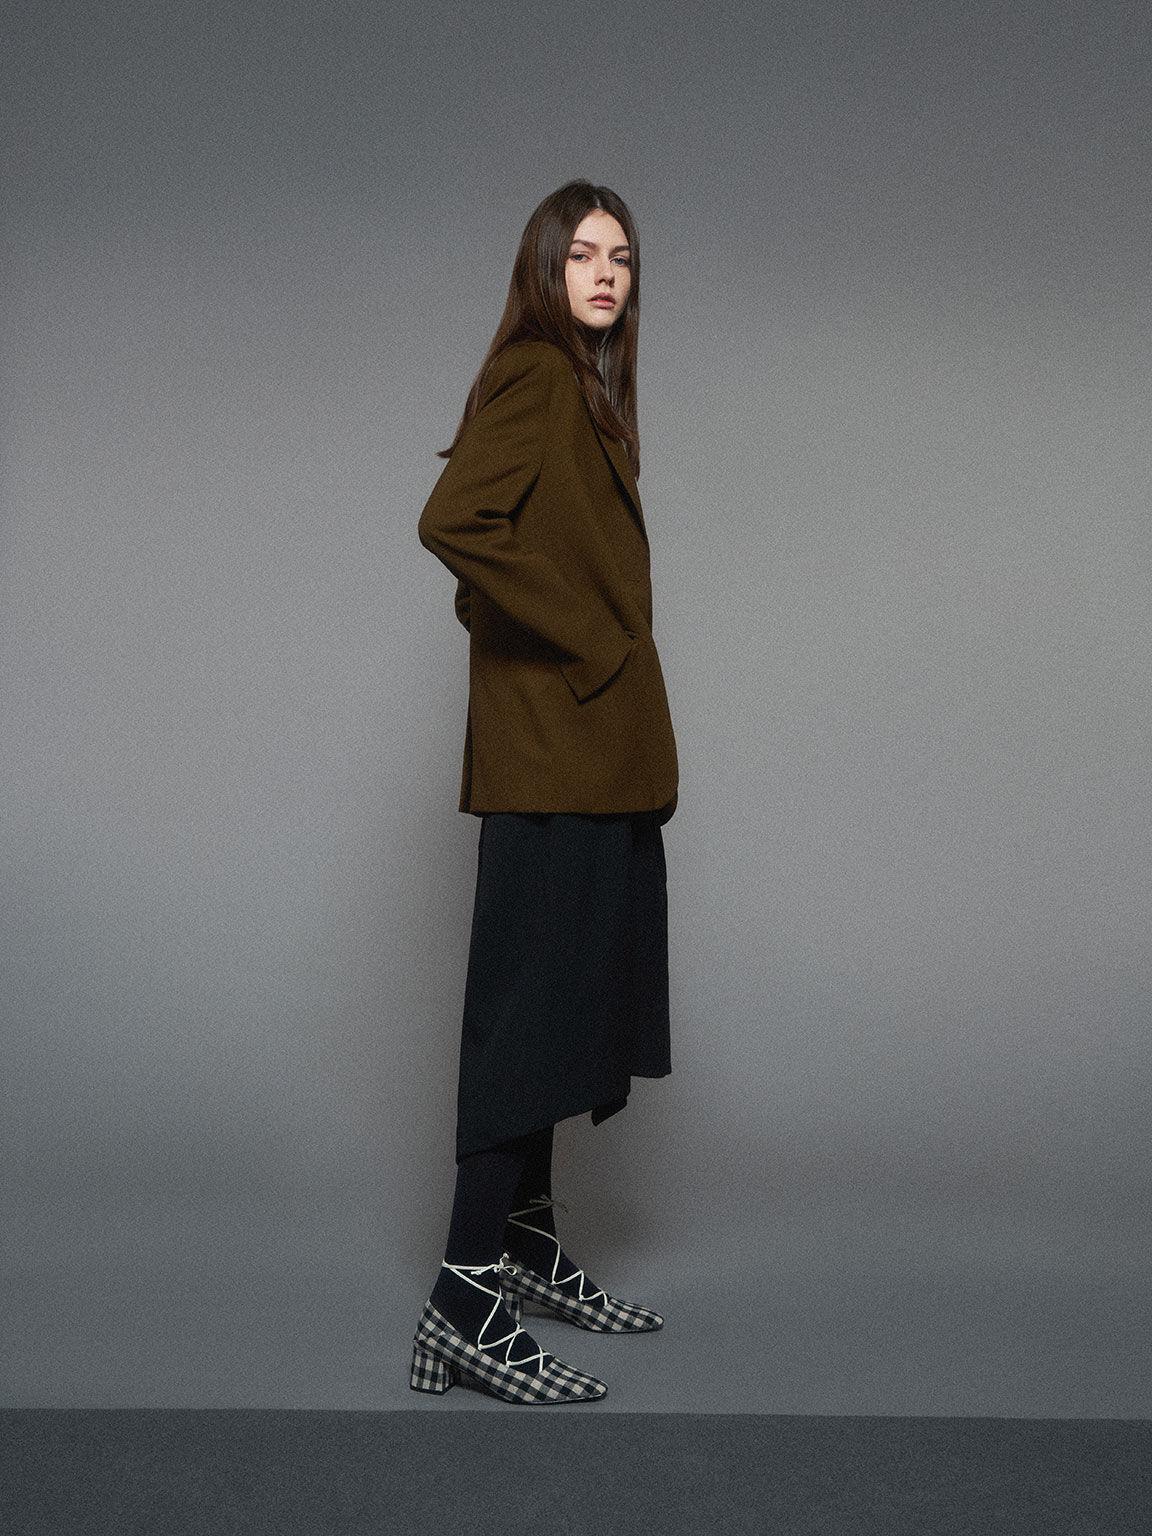 Woven Gingham Ankle Tie Pumps, Black, hi-res